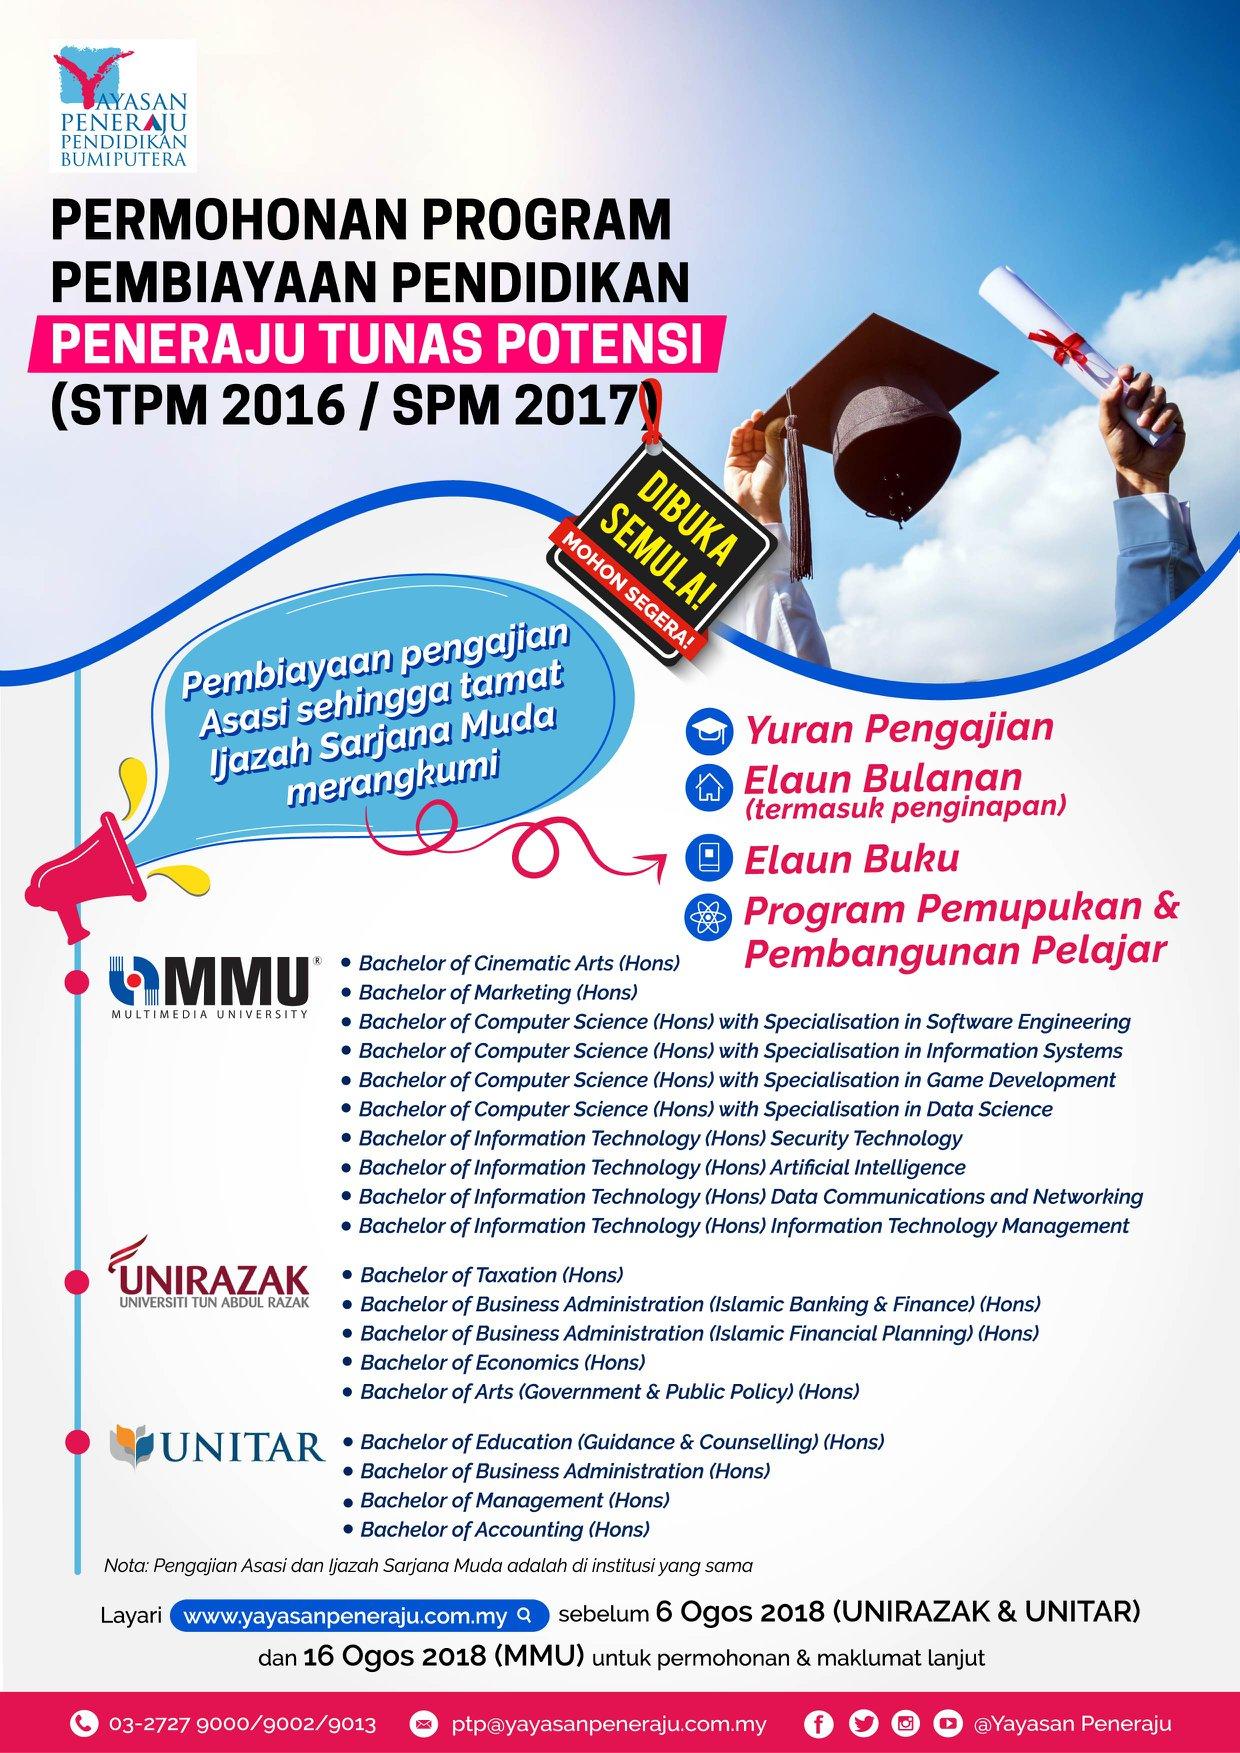 Deadline Extension For Education Financial Programme By Yayasan Peneraju